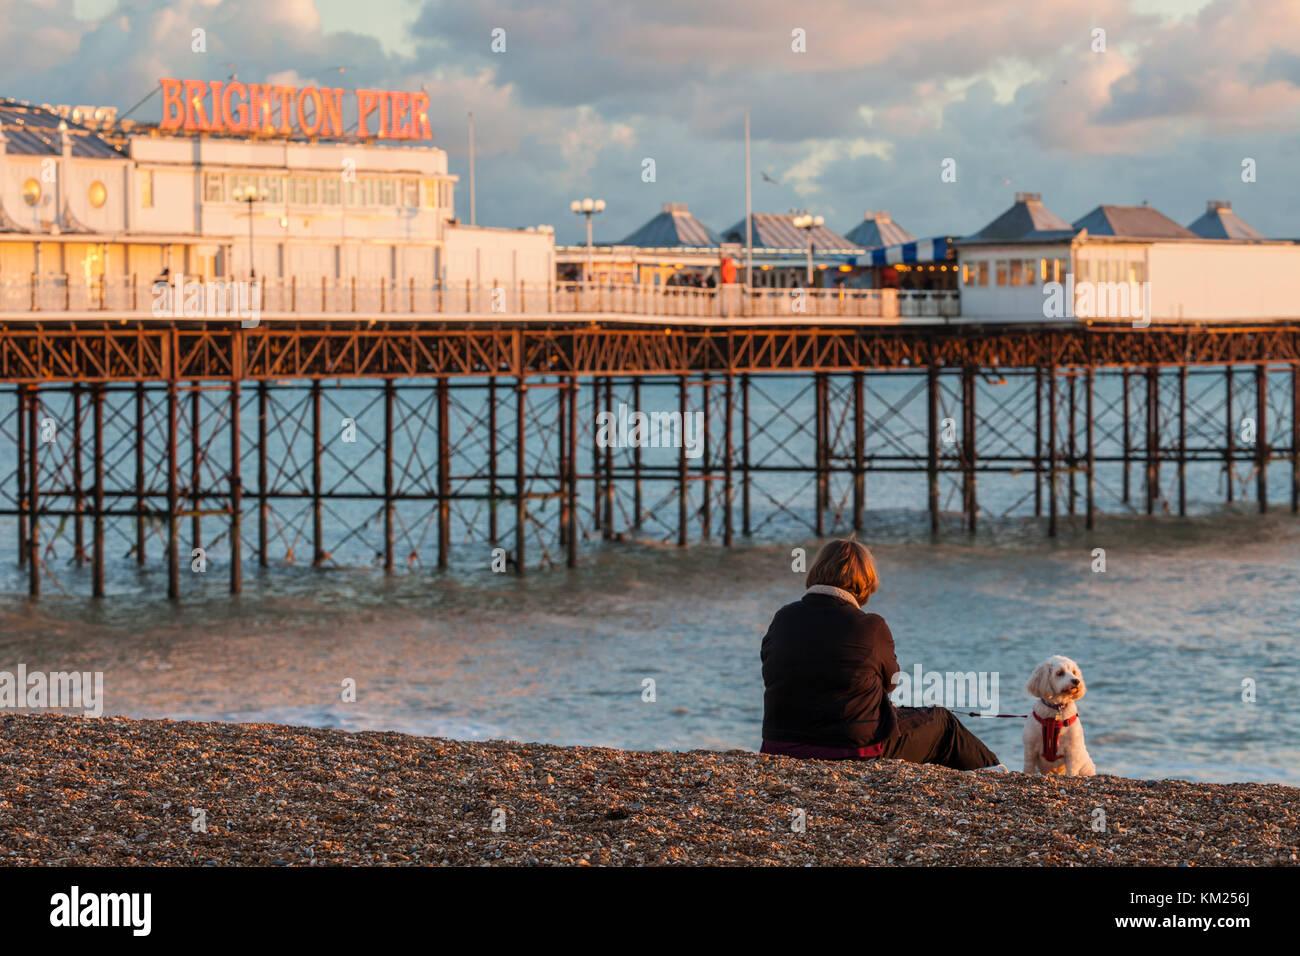 Autumn sunset on Brighton beach, East Sussex, England. - Stock Image